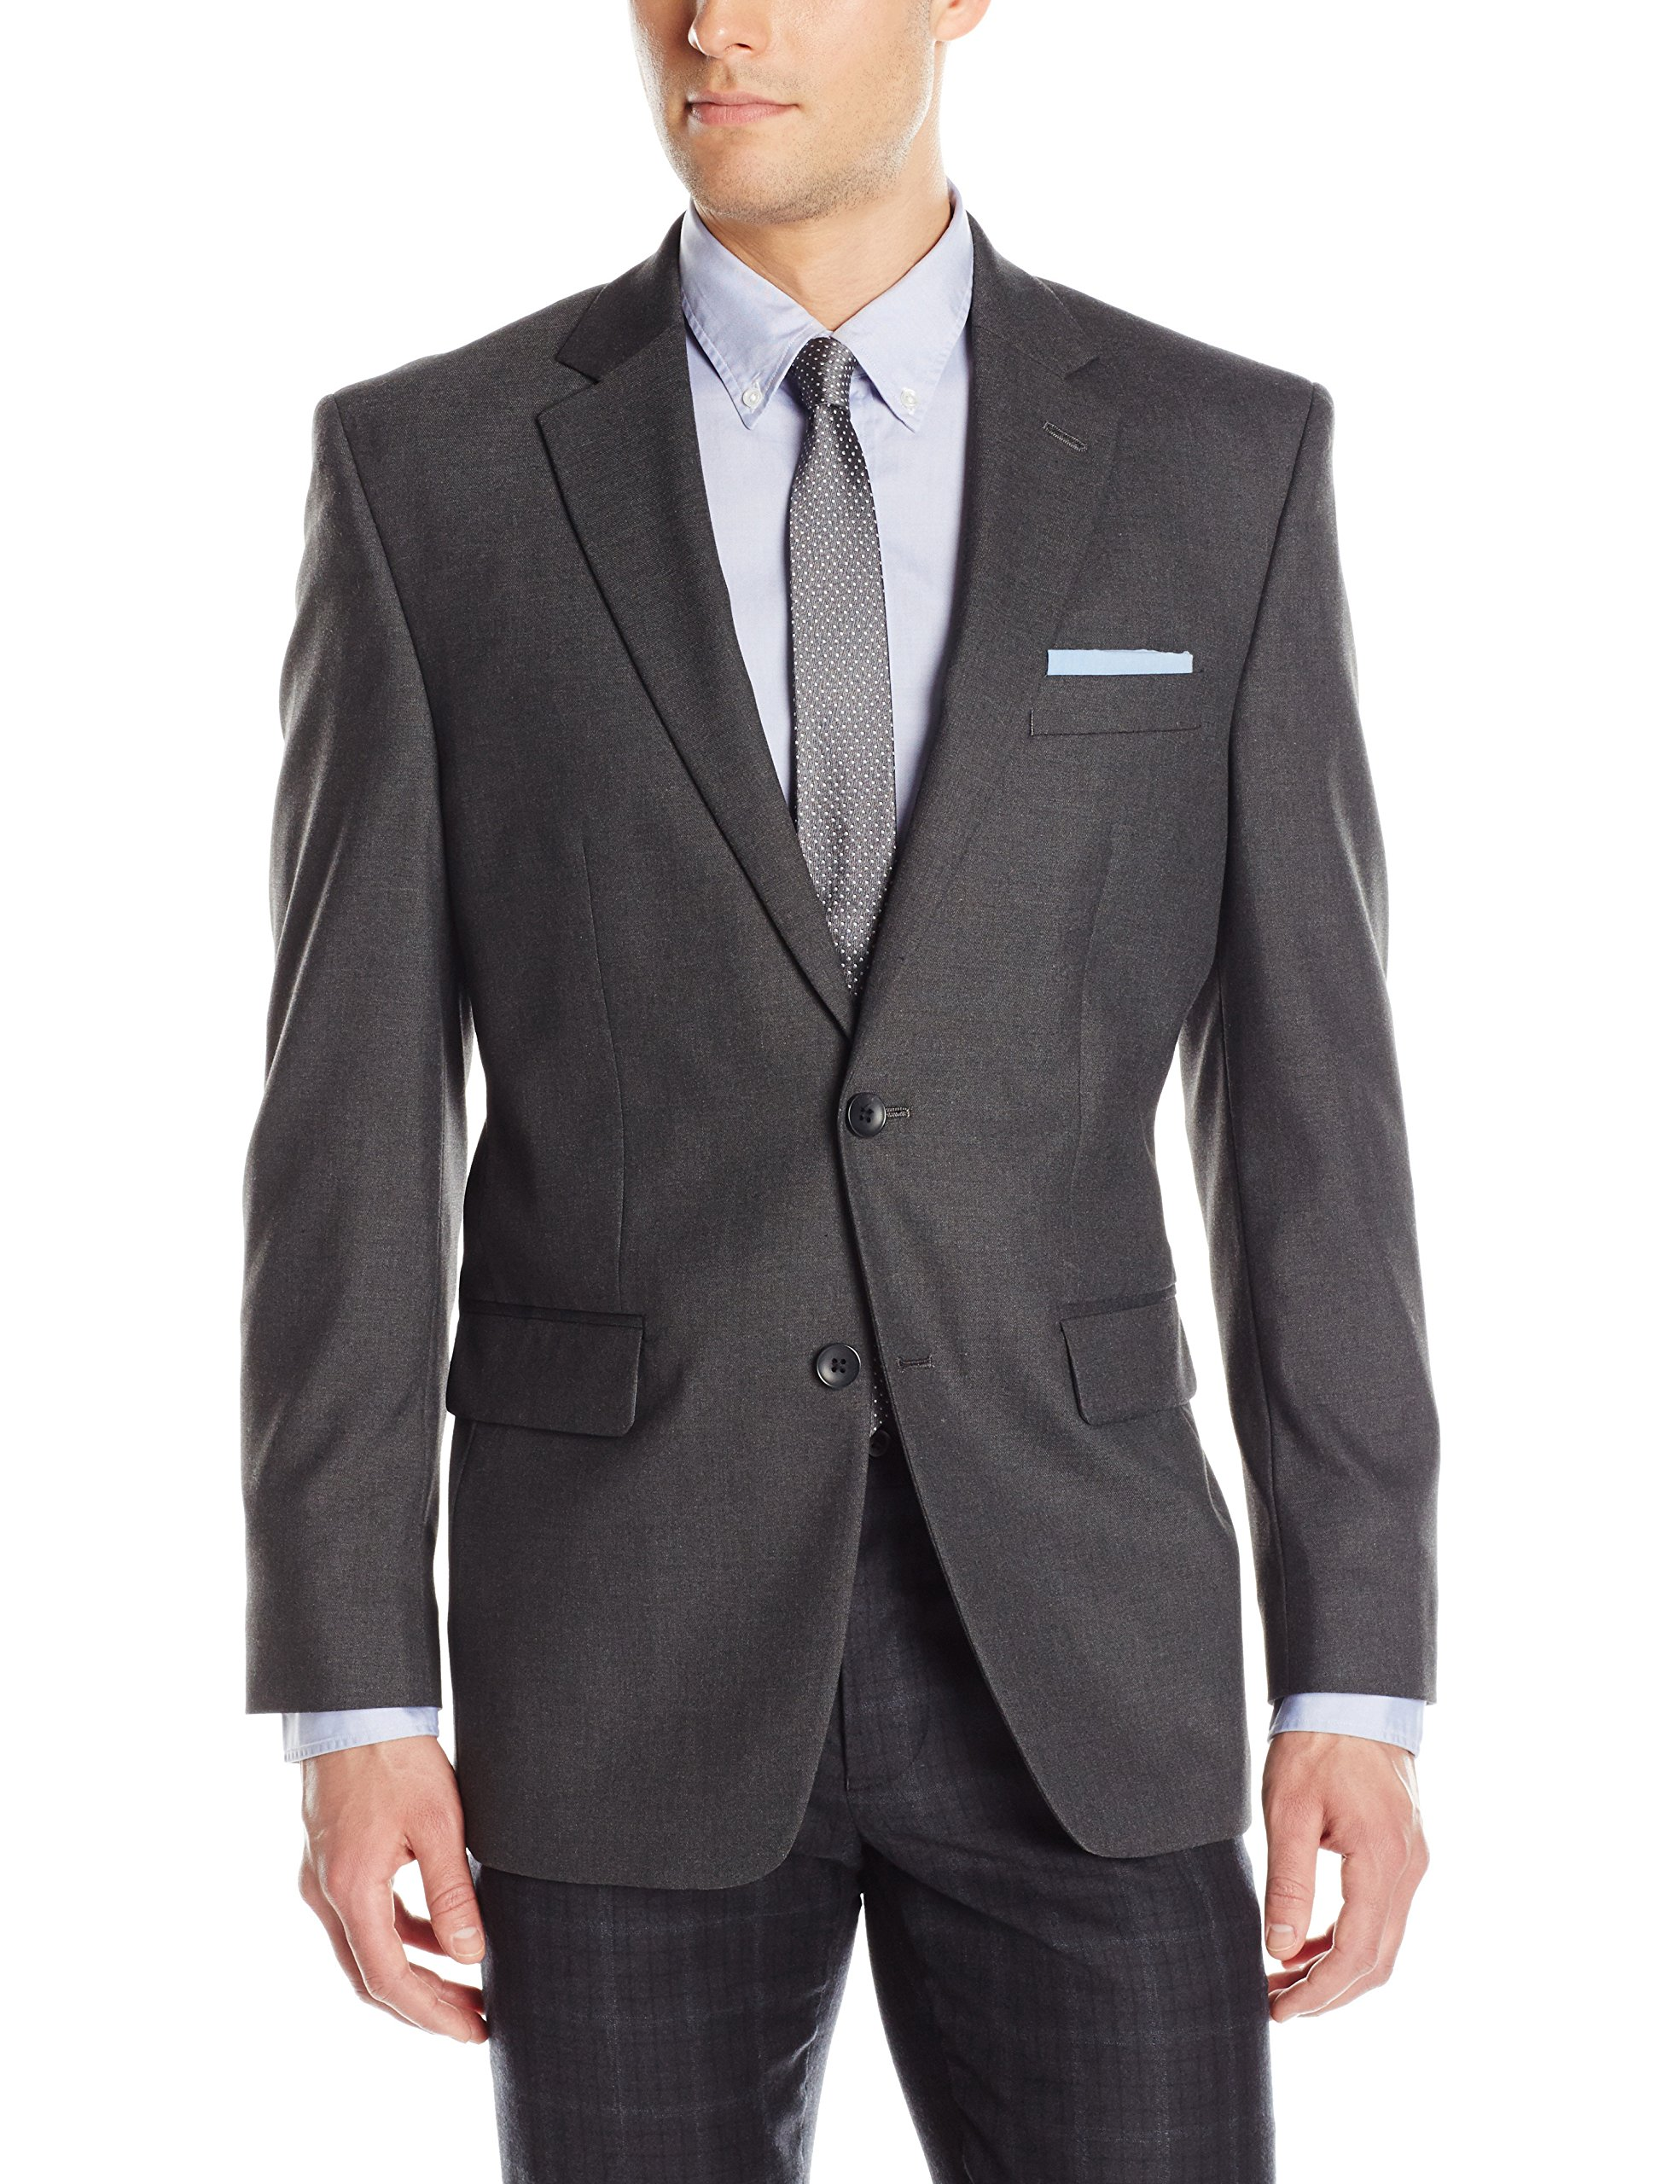 Haggar Men's J.m Premium Performance Stretch Stria 2-Button Suit Separate Coat, Dark Heather Grey, 42R